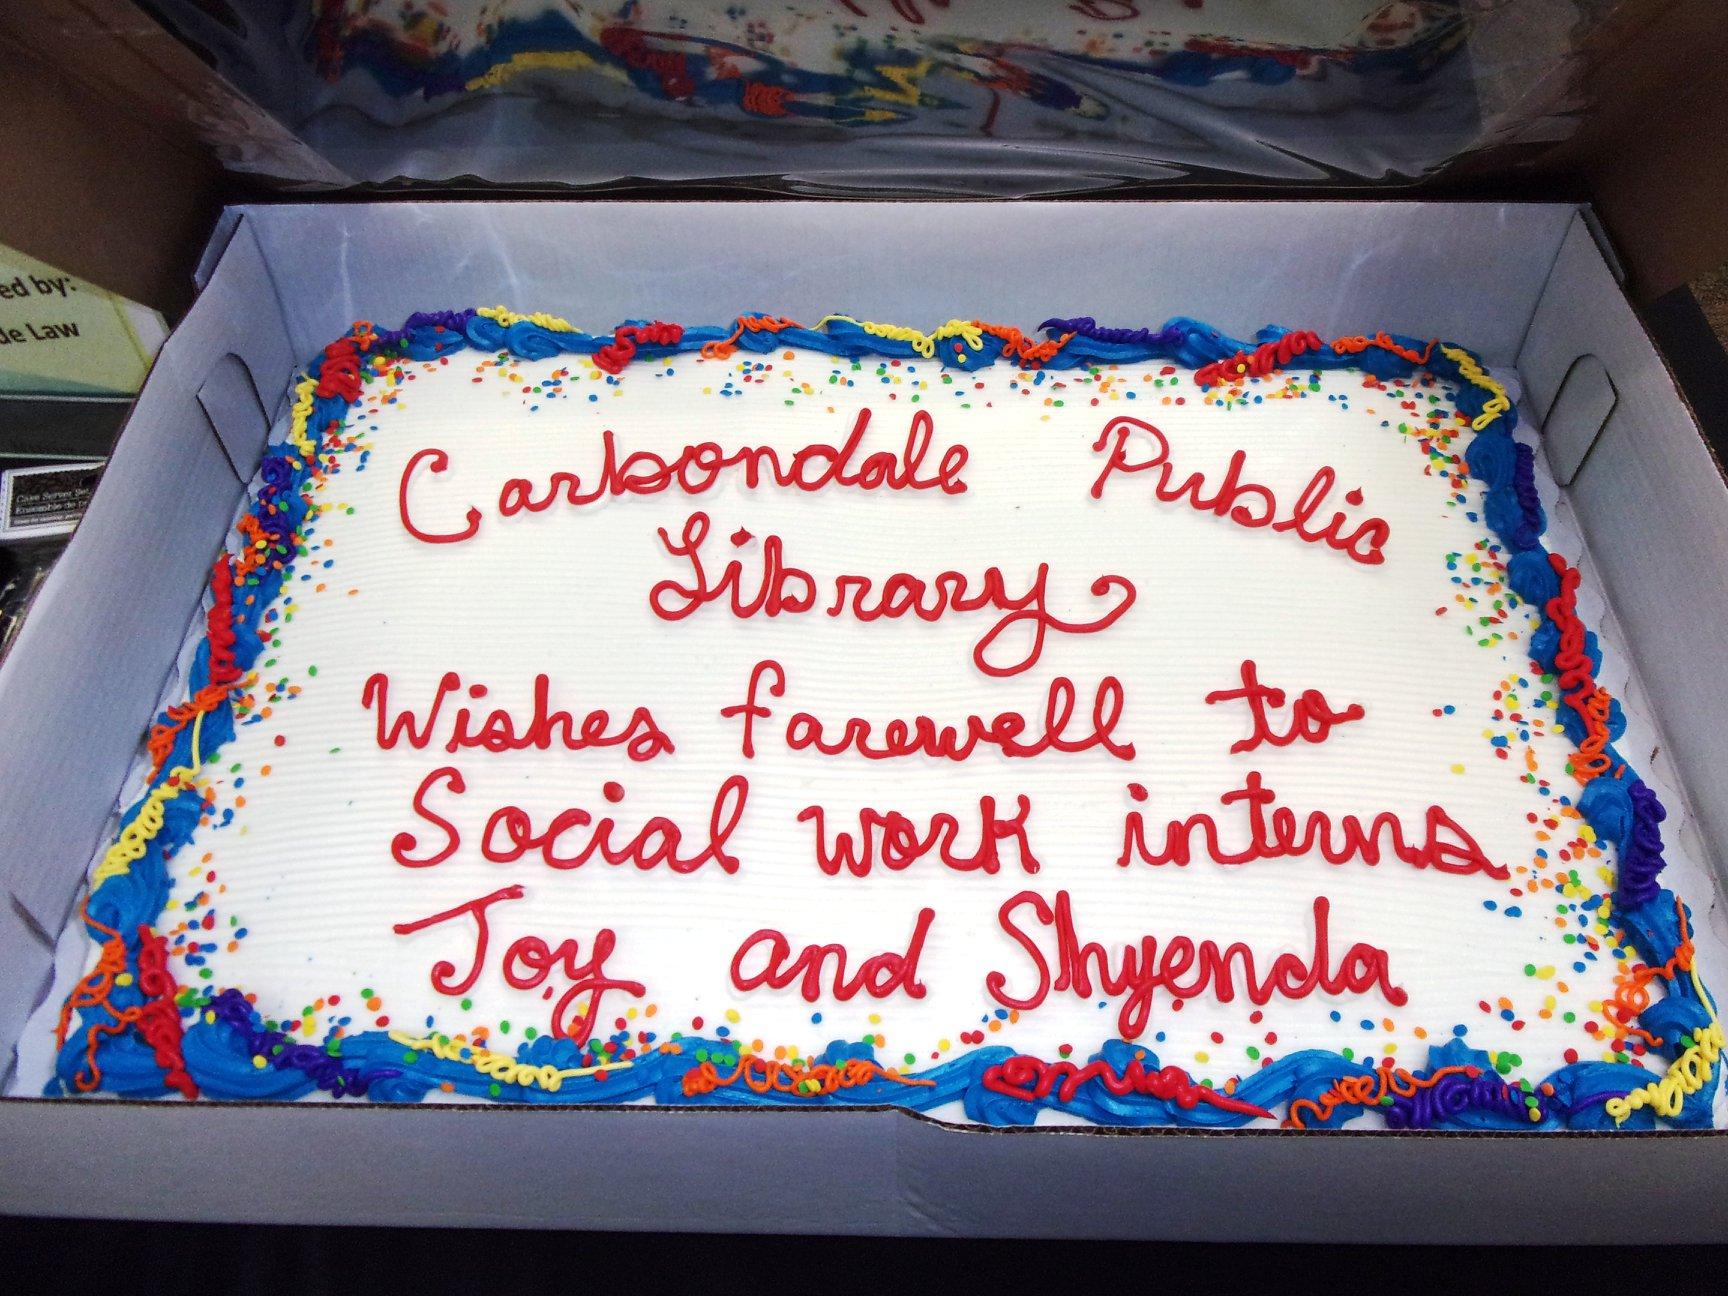 Celebrating interns